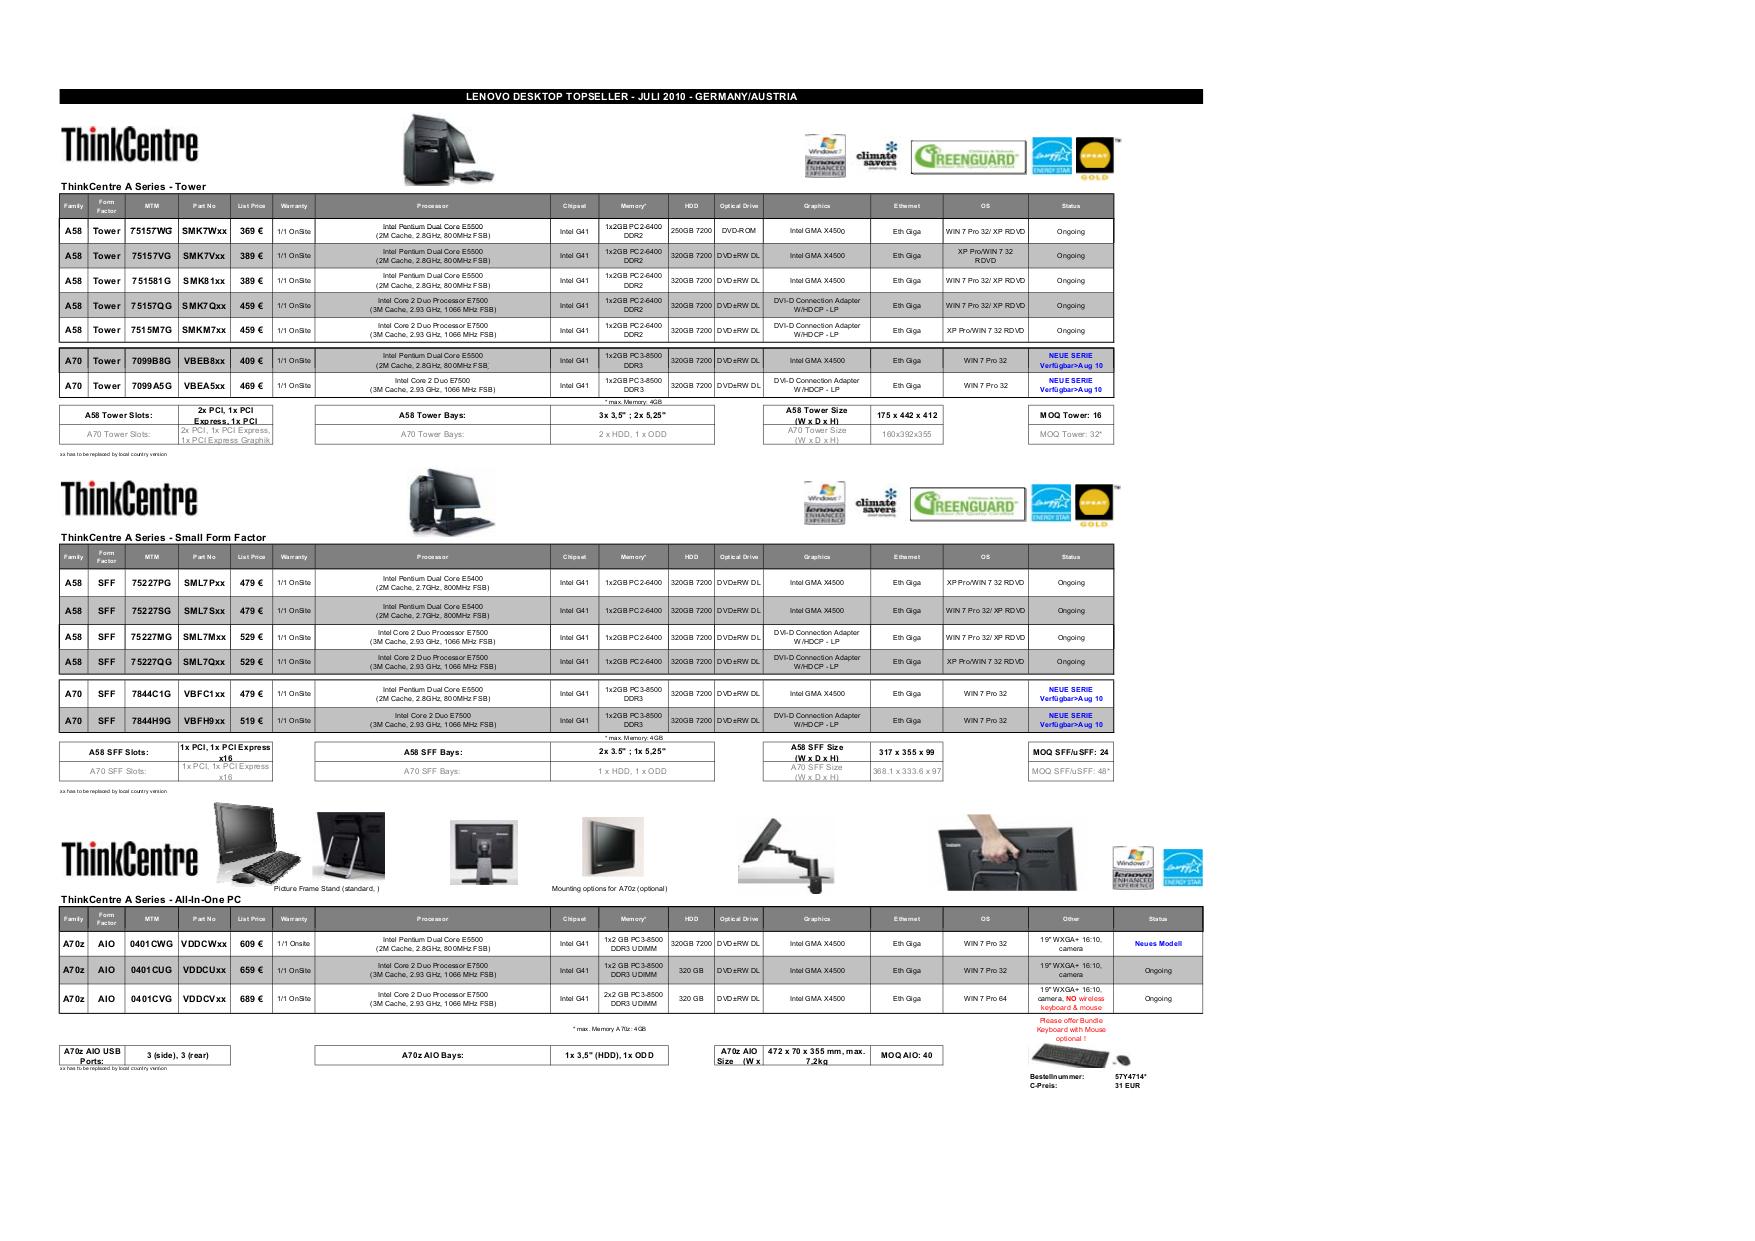 pdf for Lenovo Desktop ThinkCentre M58 4086 manual